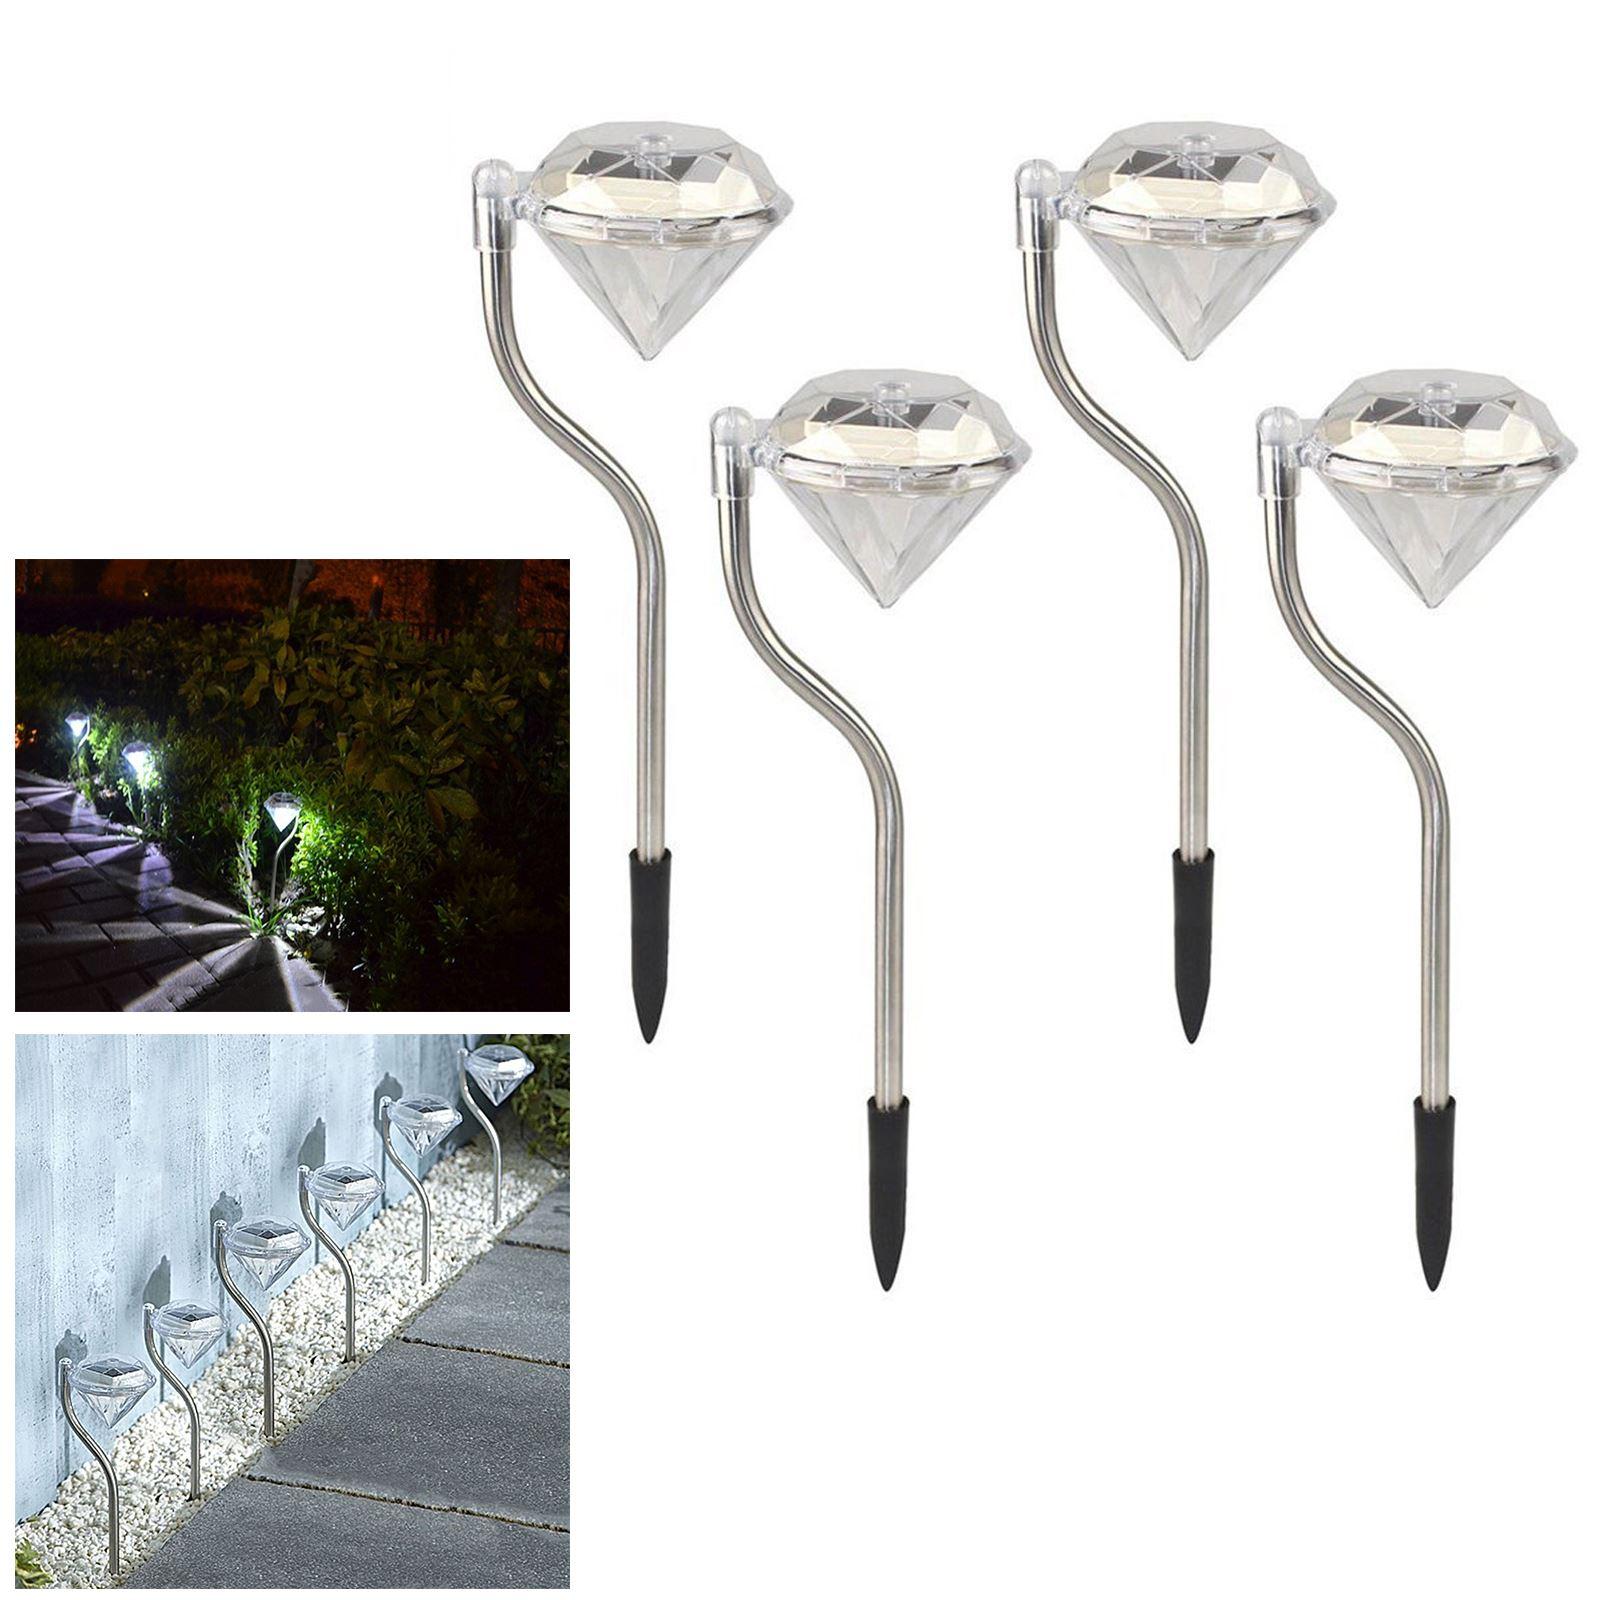 ASAB-10-x-Solar-Powered-Stainless-Steel-Garden-Post-Lights-LED-Outdoor-Lighting thumbnail 18